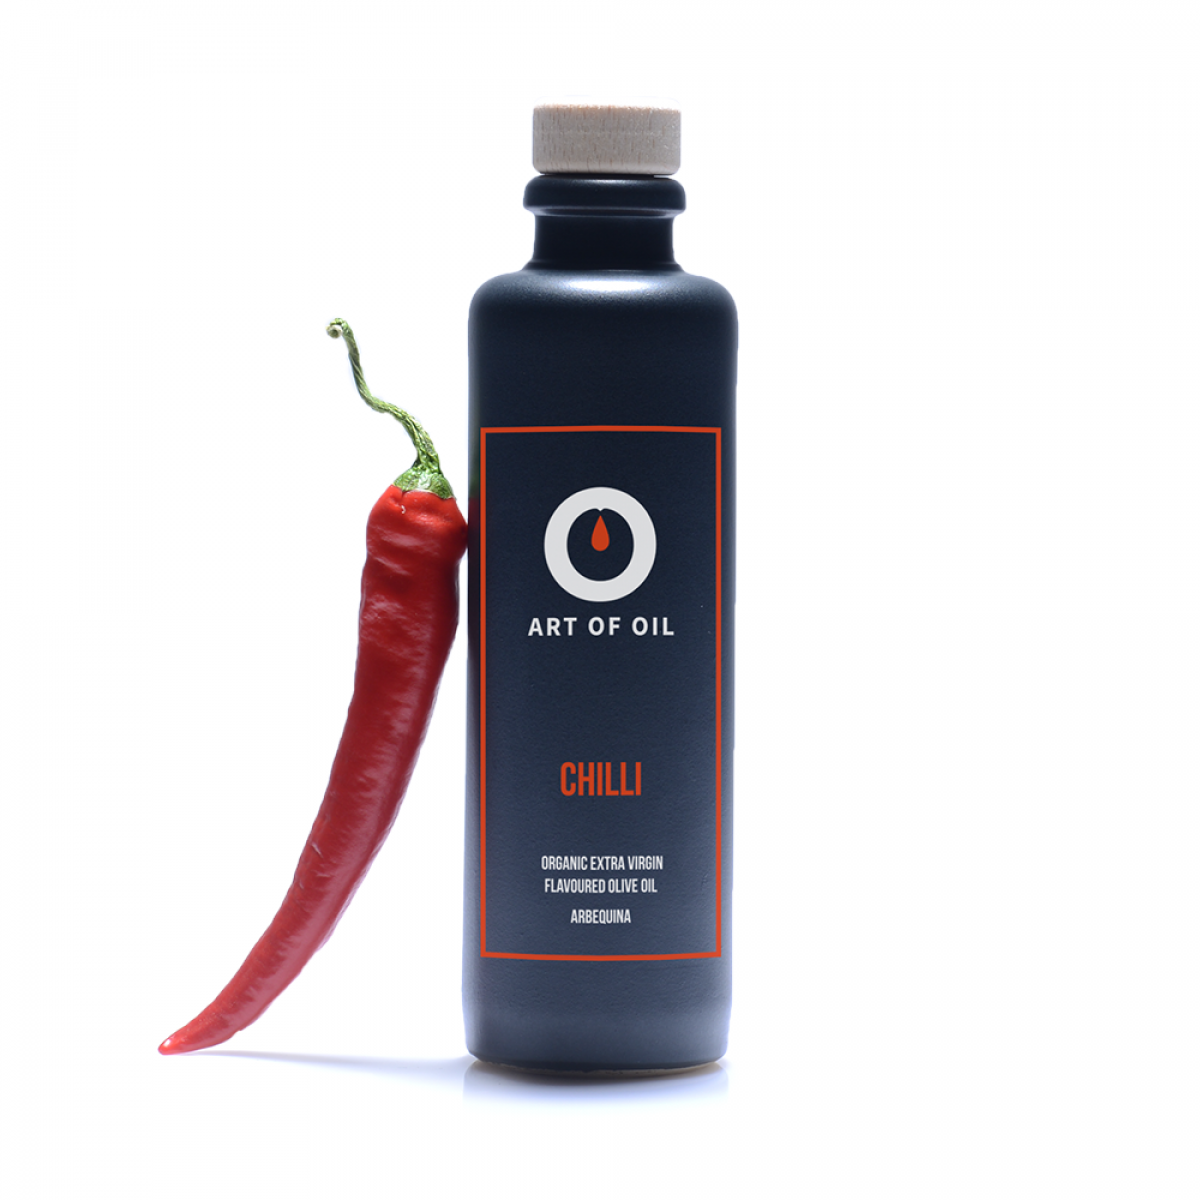 ART OF OIL Biologisches Extra Virgin Olivenöl - Chilli (200ml)